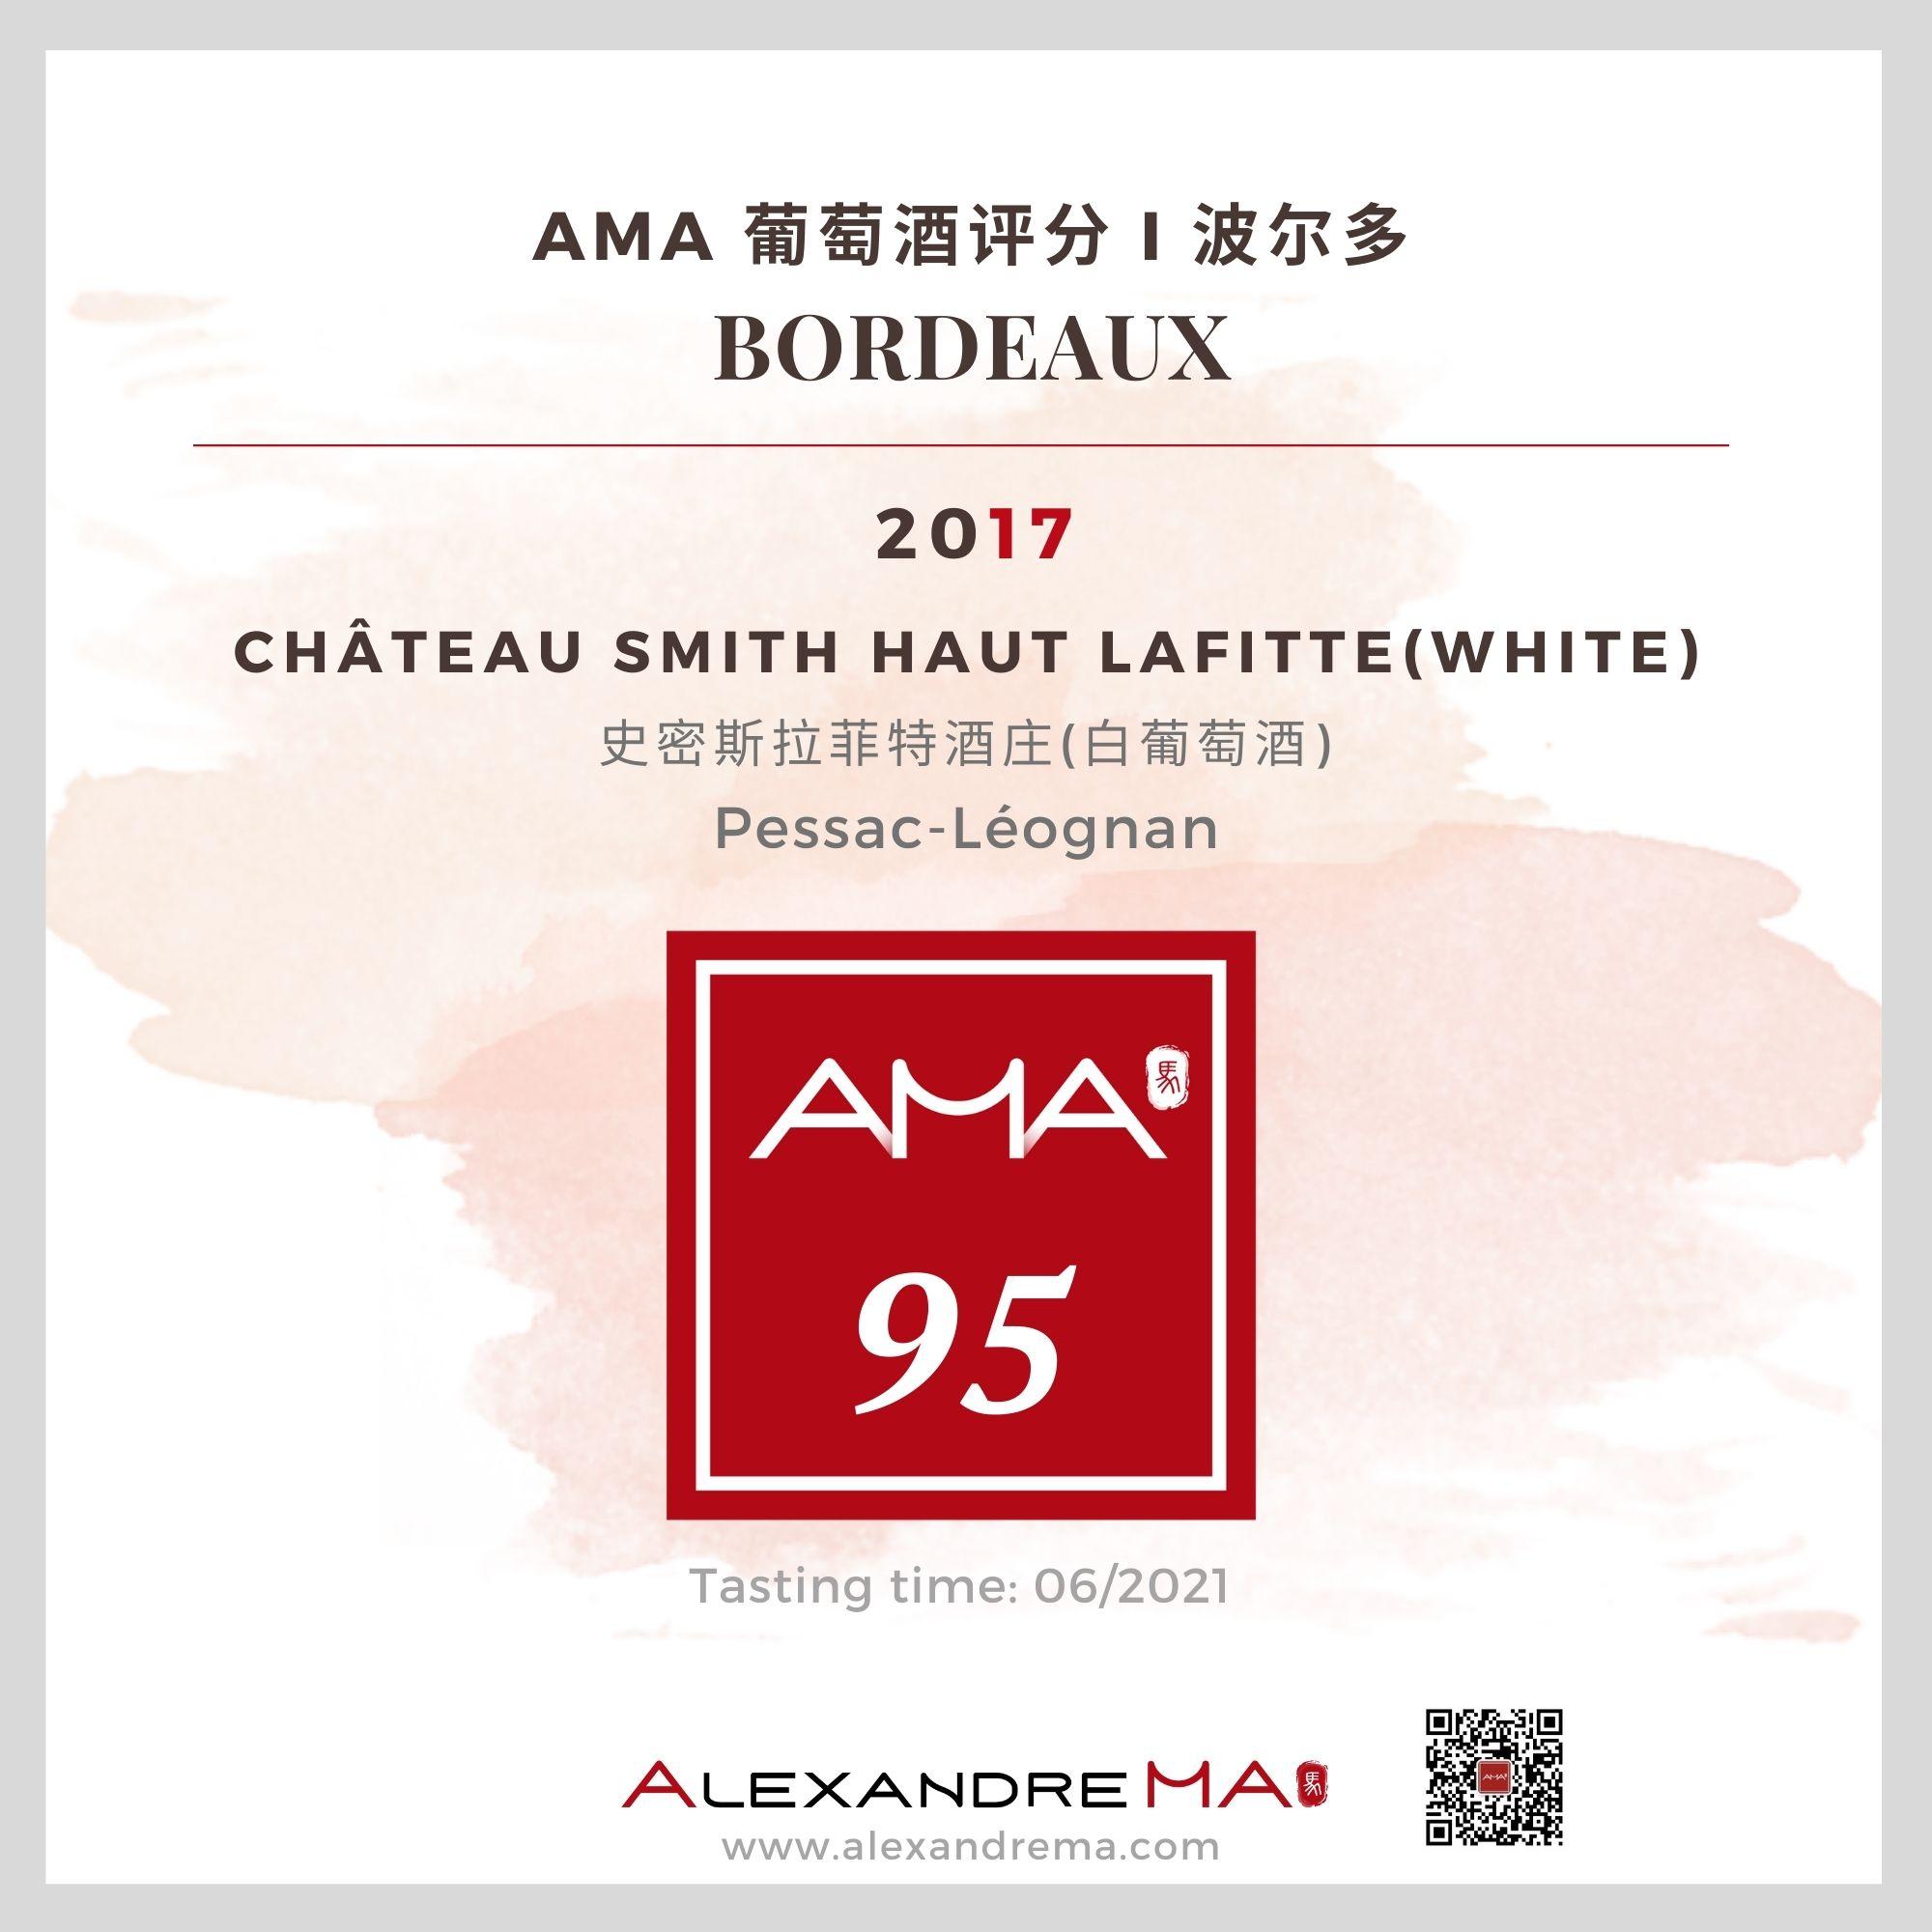 Château Smith Haut Lafitte White 2017 - Alexandre MA